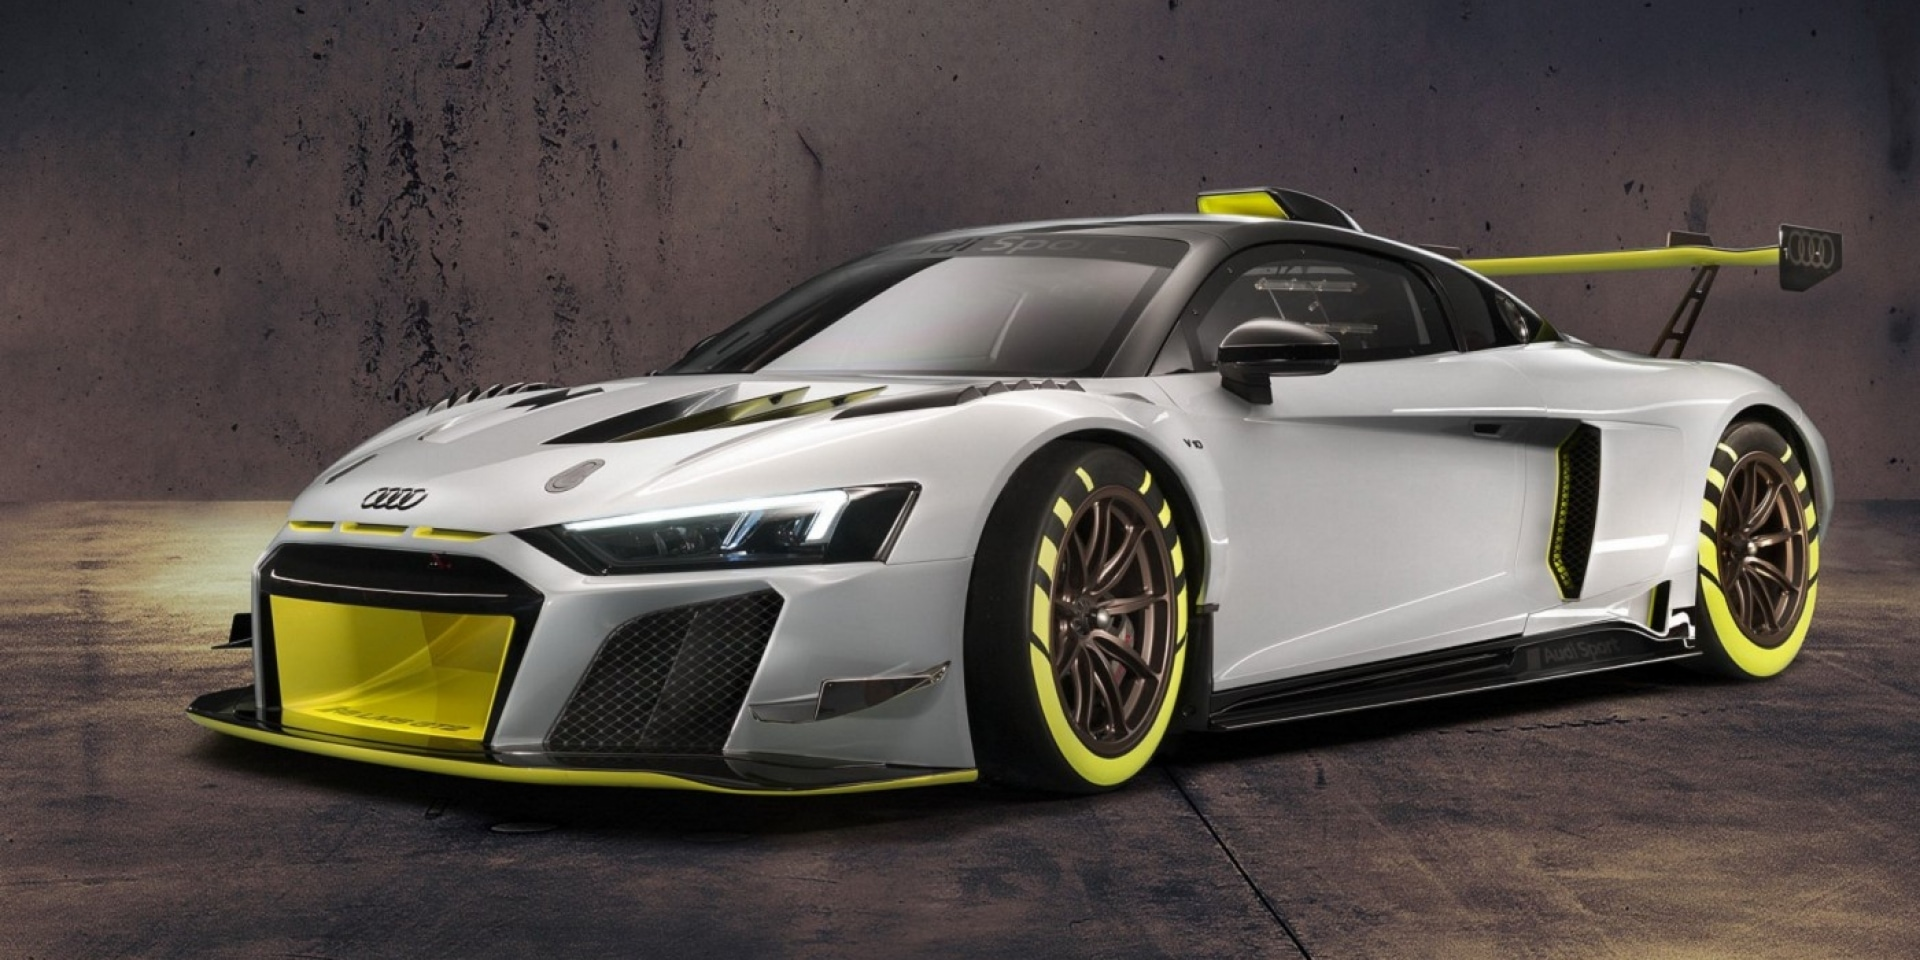 Audi Sport推出第四款最強賽車R8 LMS GT2,售價破台幣千萬